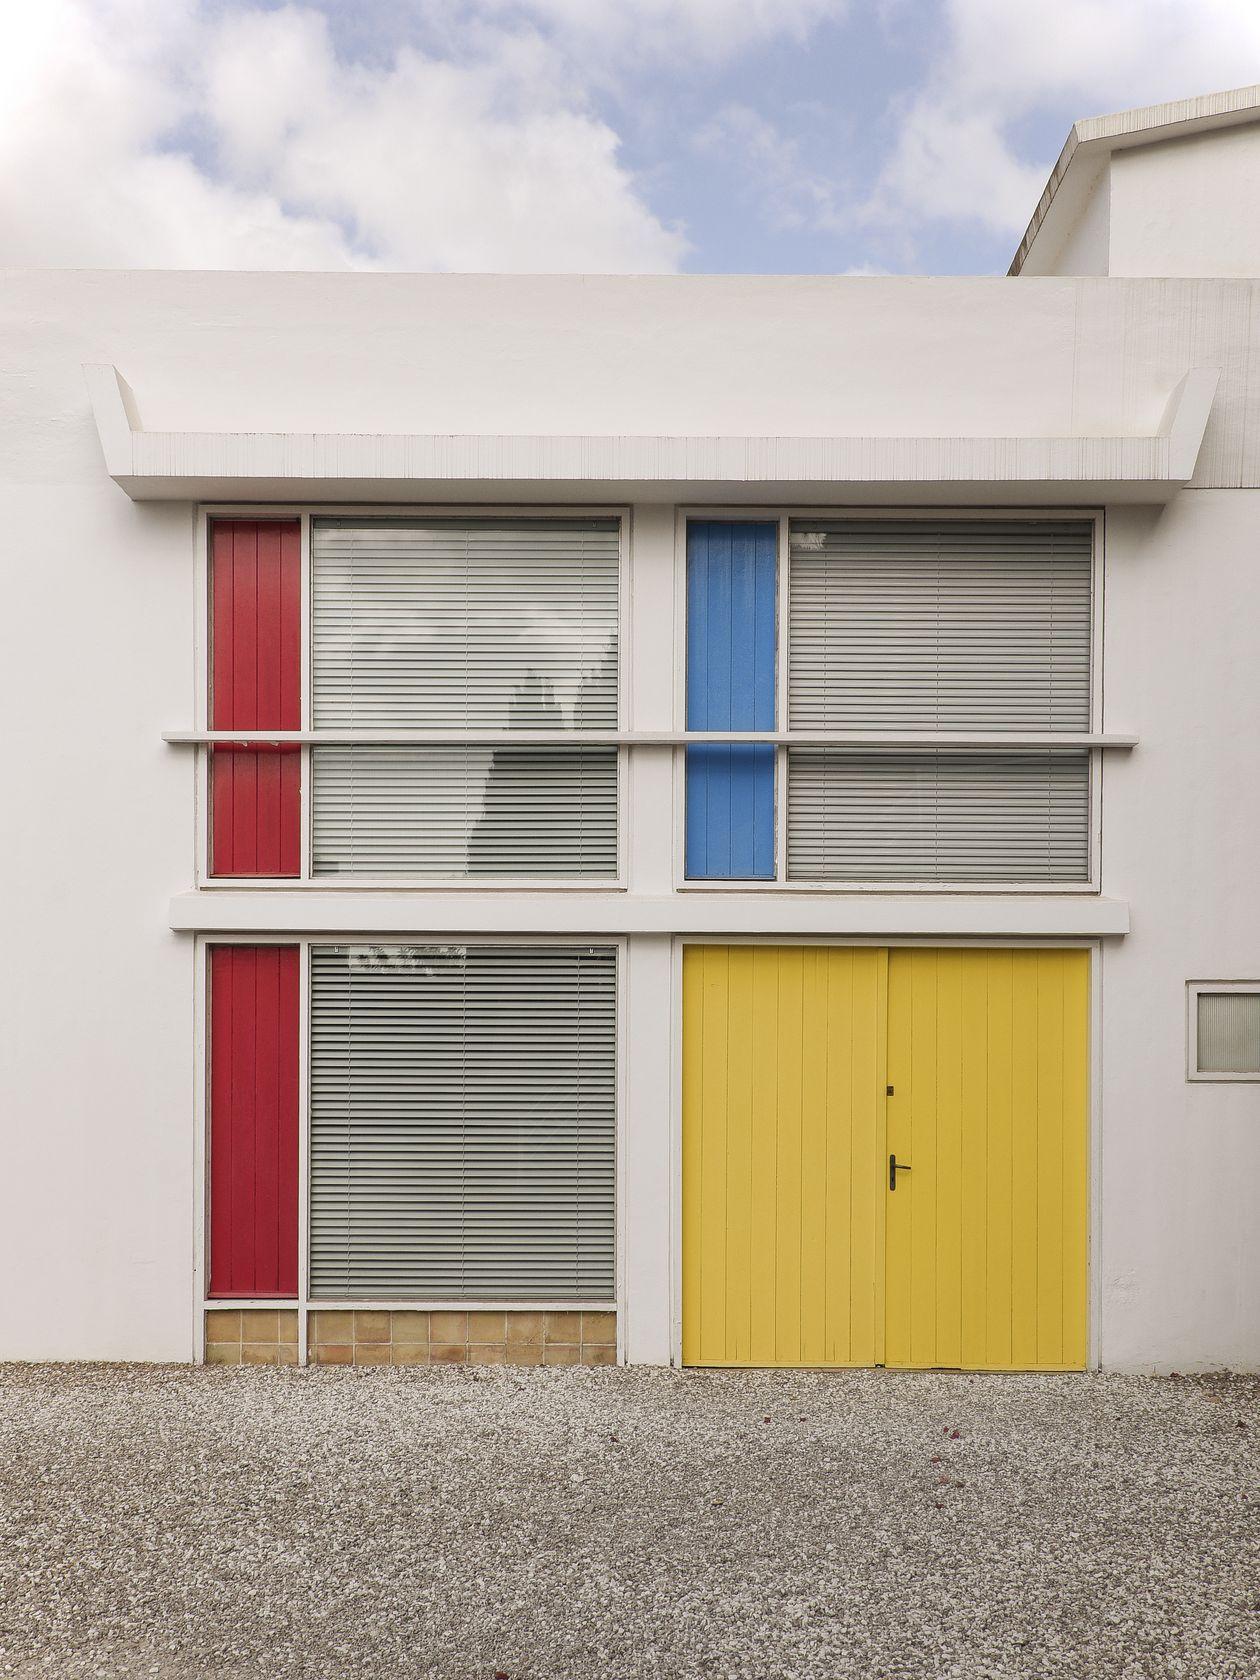 Taller Sert, Fundació Miró Mallorca